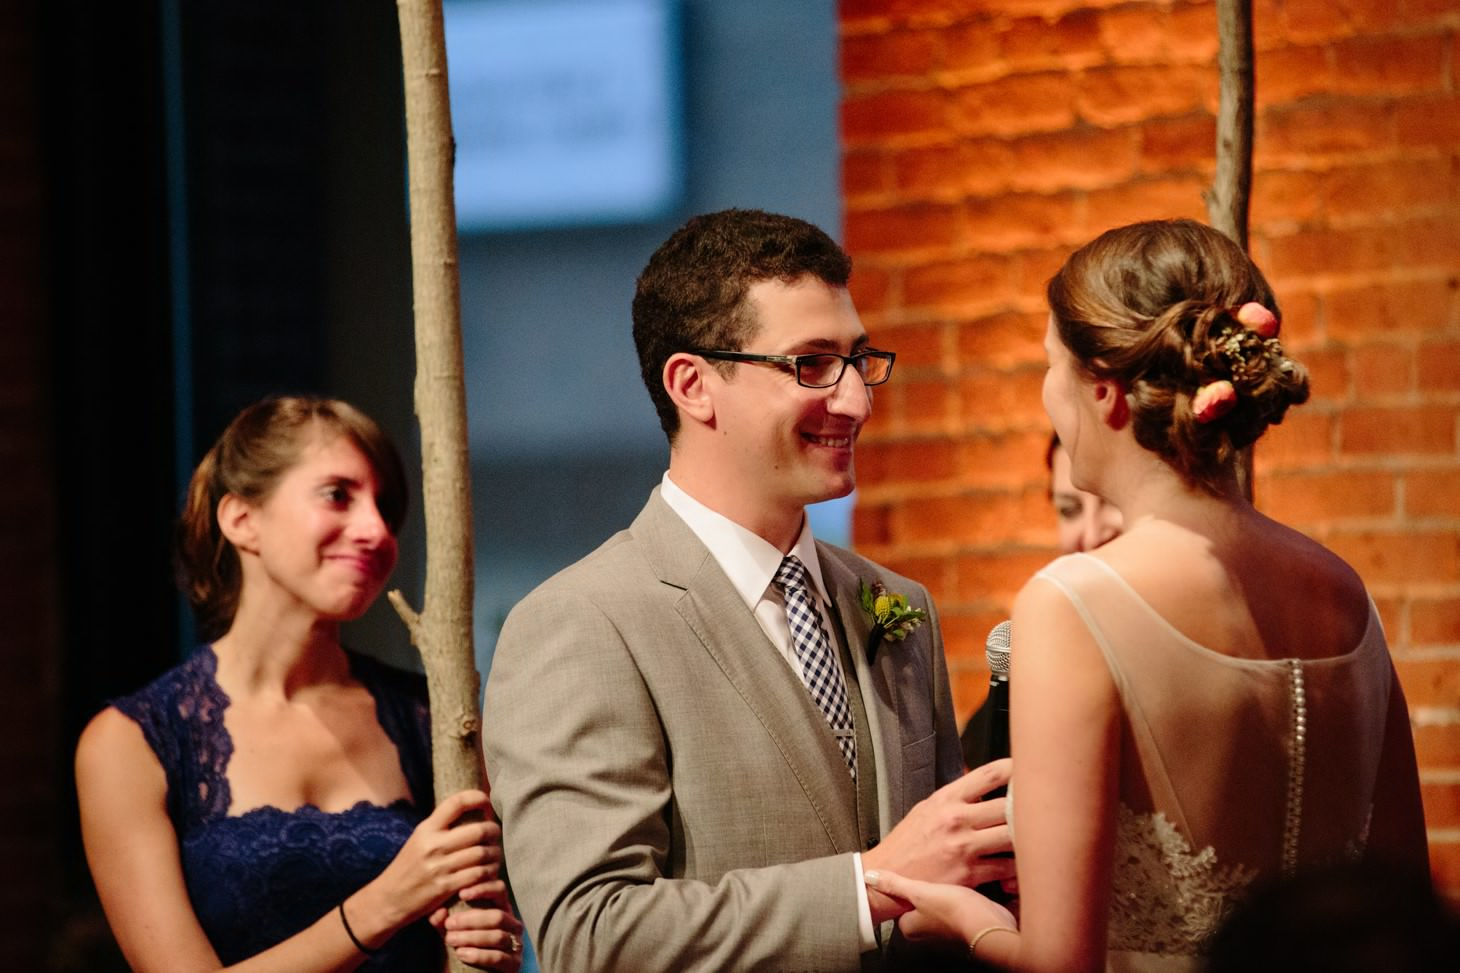 018-nyc-dumbo-loft-brooklyn-wedding-photographer-smitten-chickens-photo-.jpg